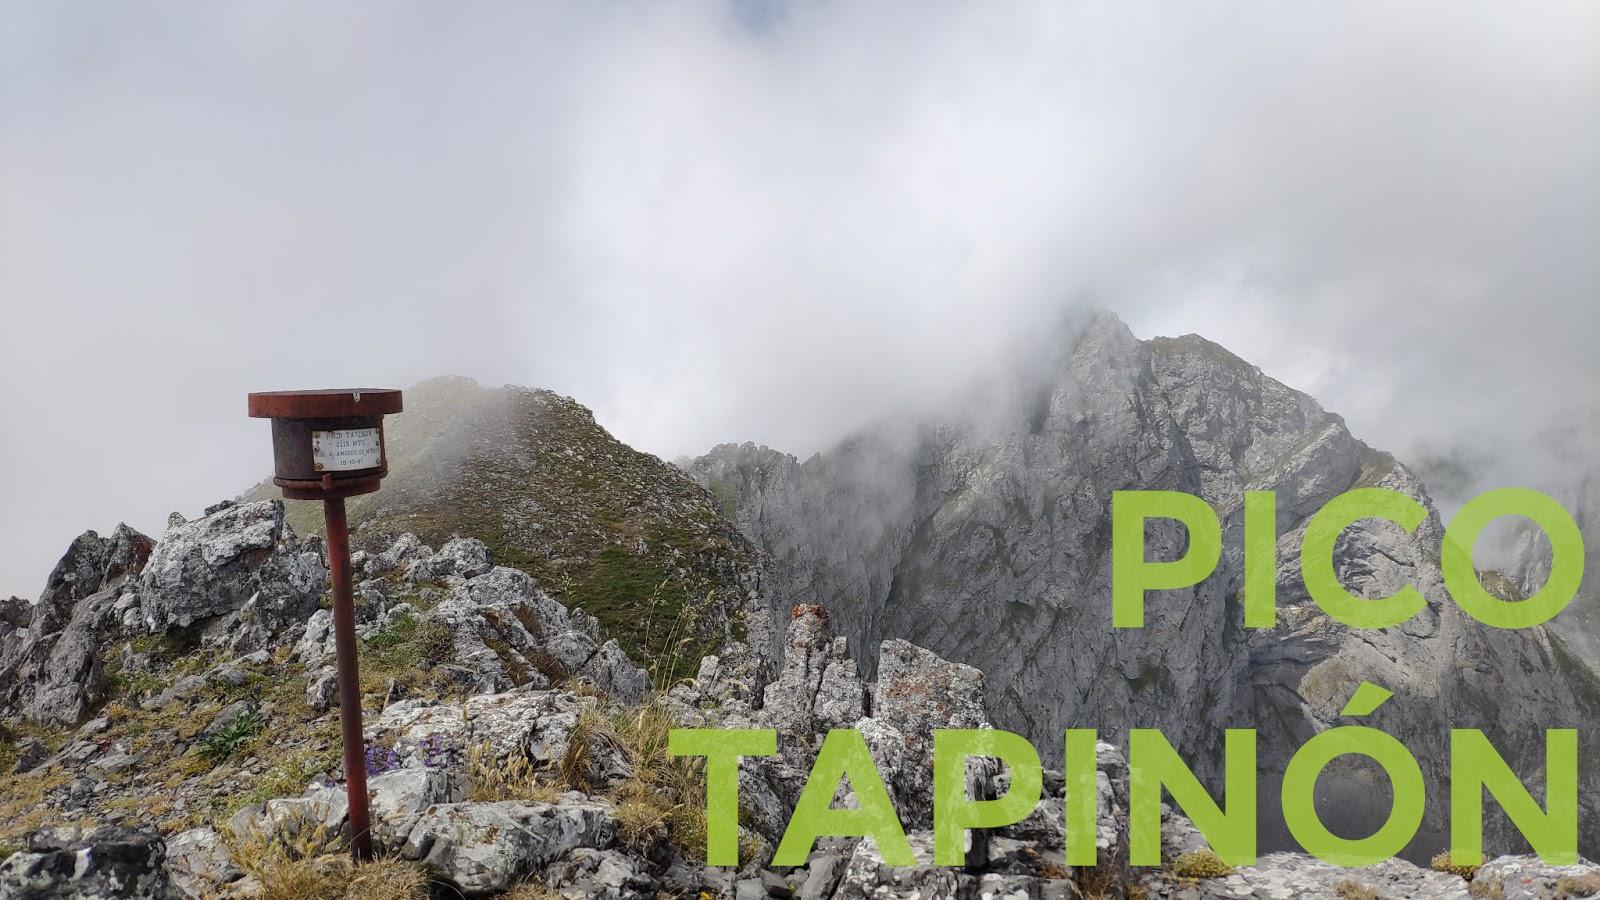 Buzón de cumbre del Pico Tapinón